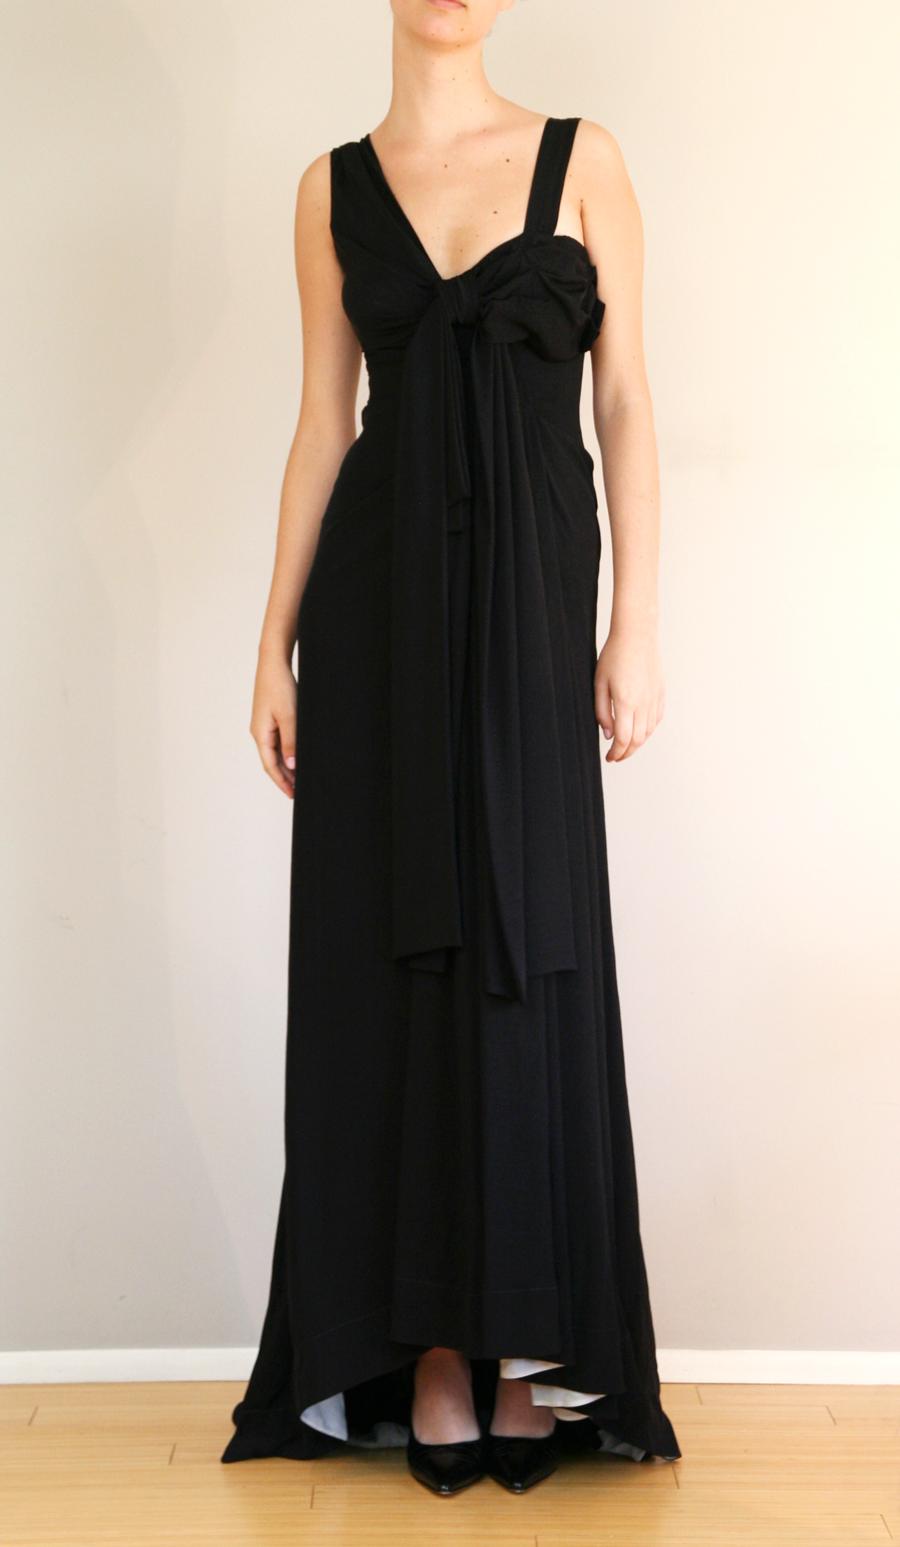 PRADA DRESS  SHOP-HERS....love♥ ( VIP Fashion Australia  www.vipfashionaus... - international clothes shop ) c70e18de80